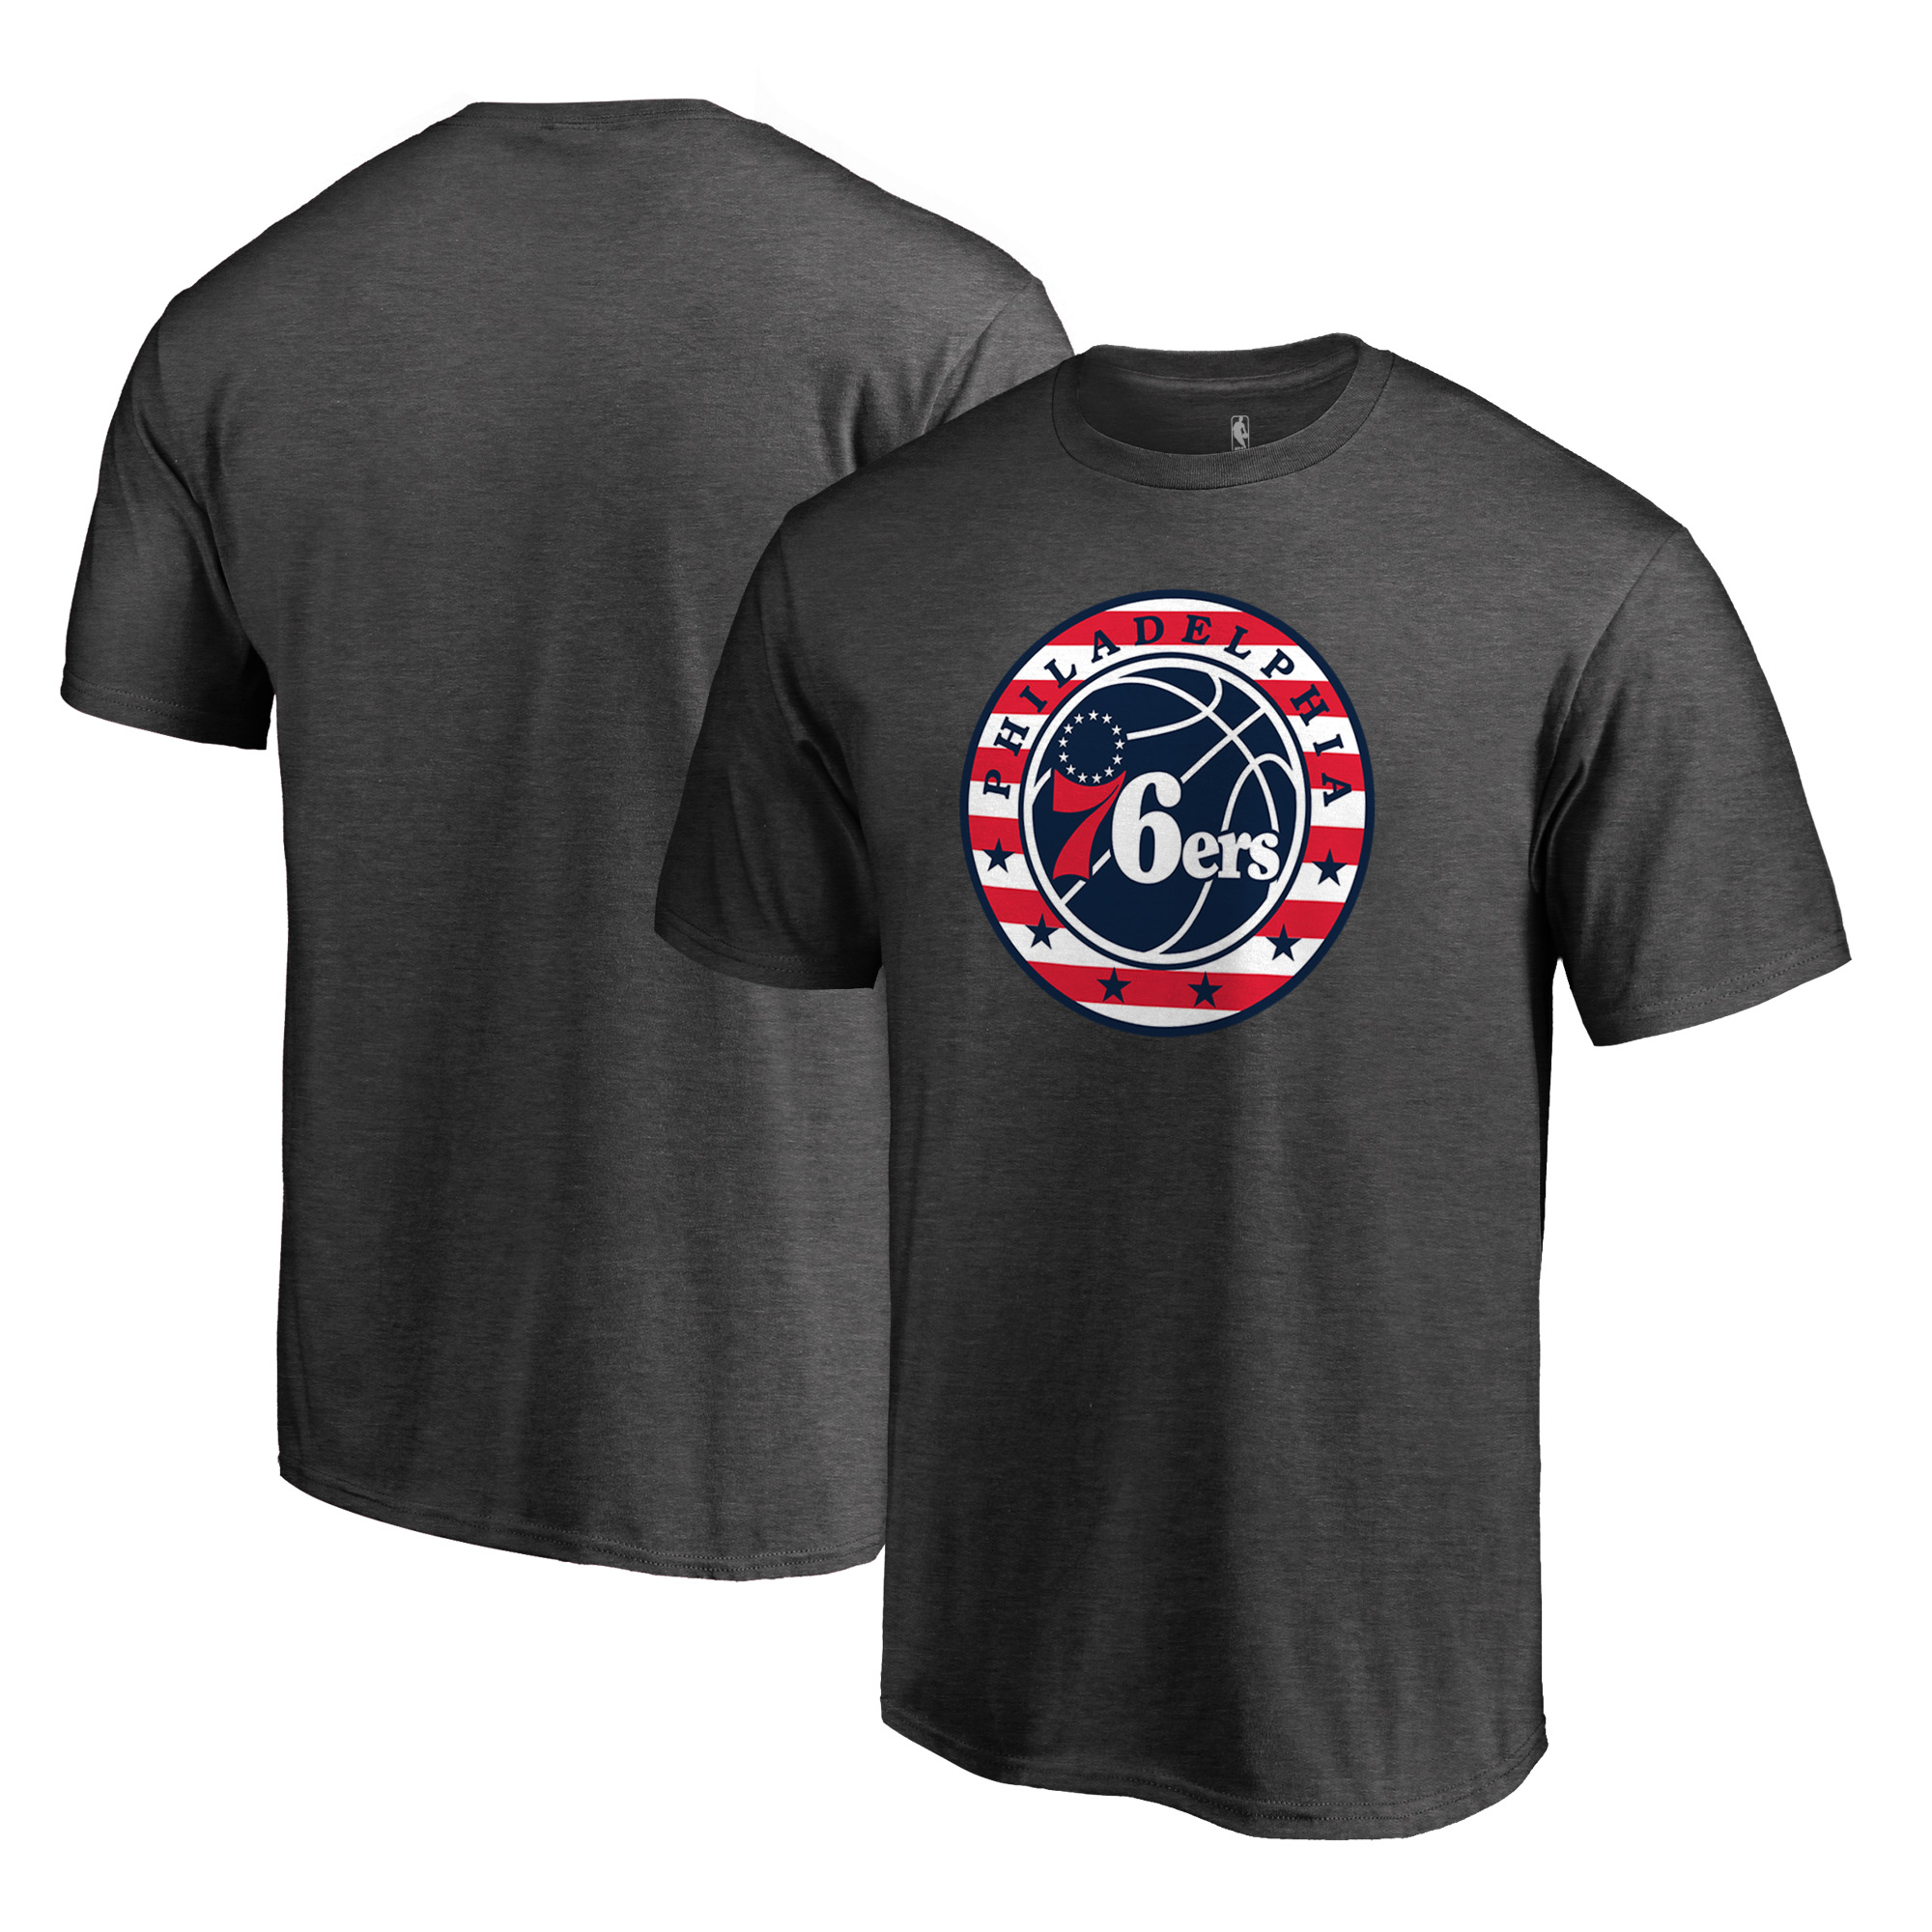 Philadelphia 76ers Fanatics Branded NBA Hoops for Troops T-Shirt - Gray